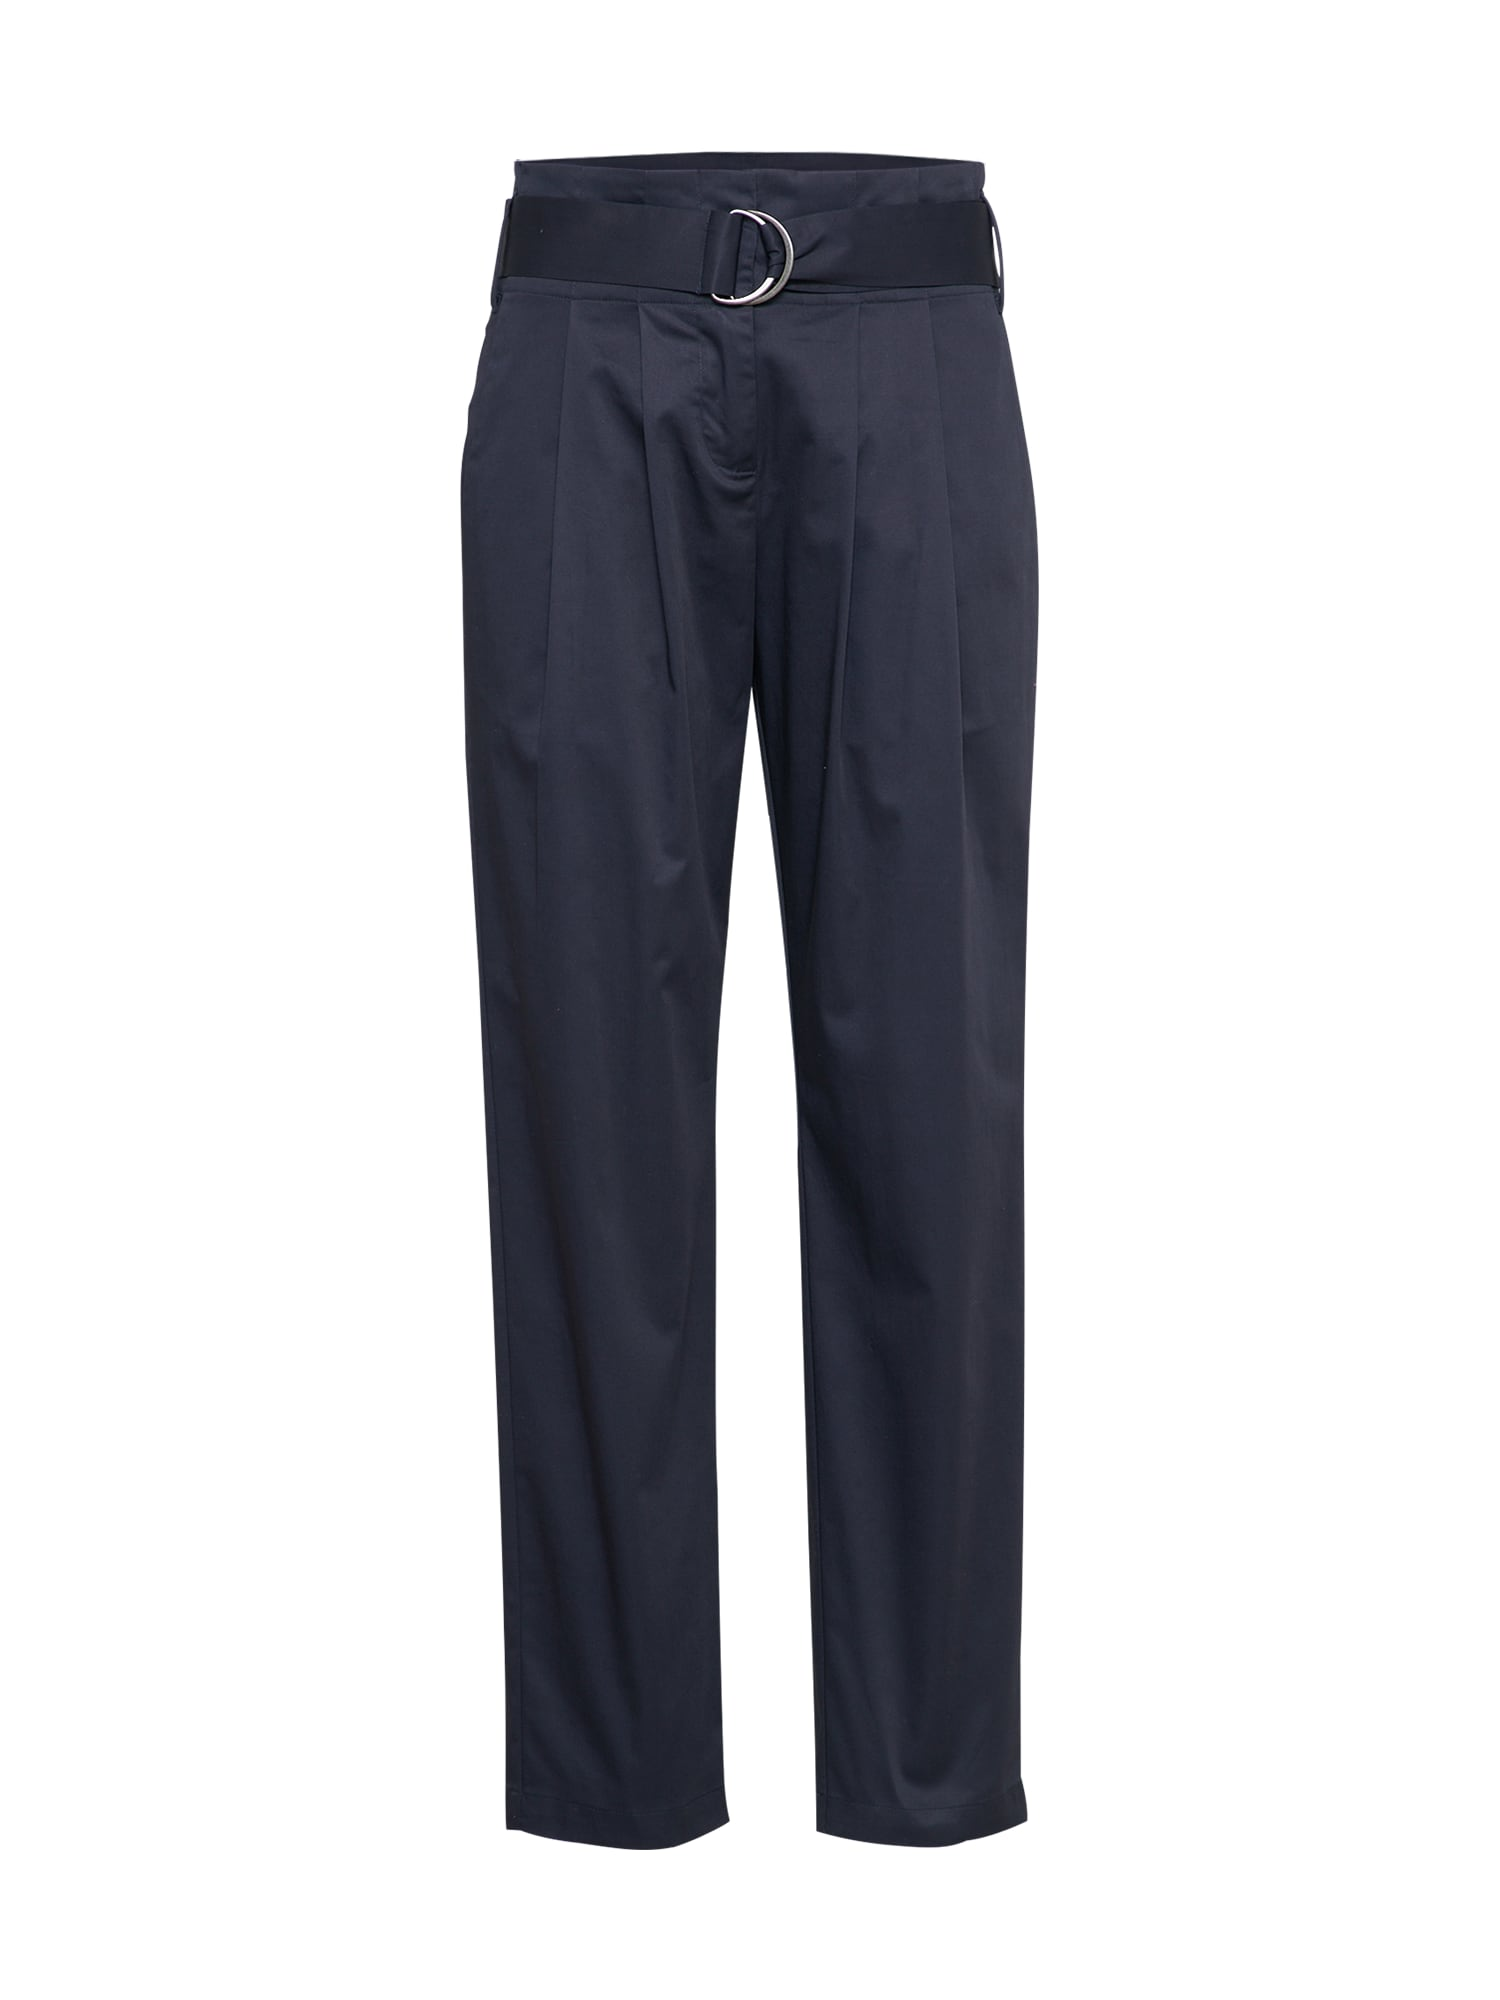 Kalhoty se sklady v pase tmavě modrá SAINT TROPEZ